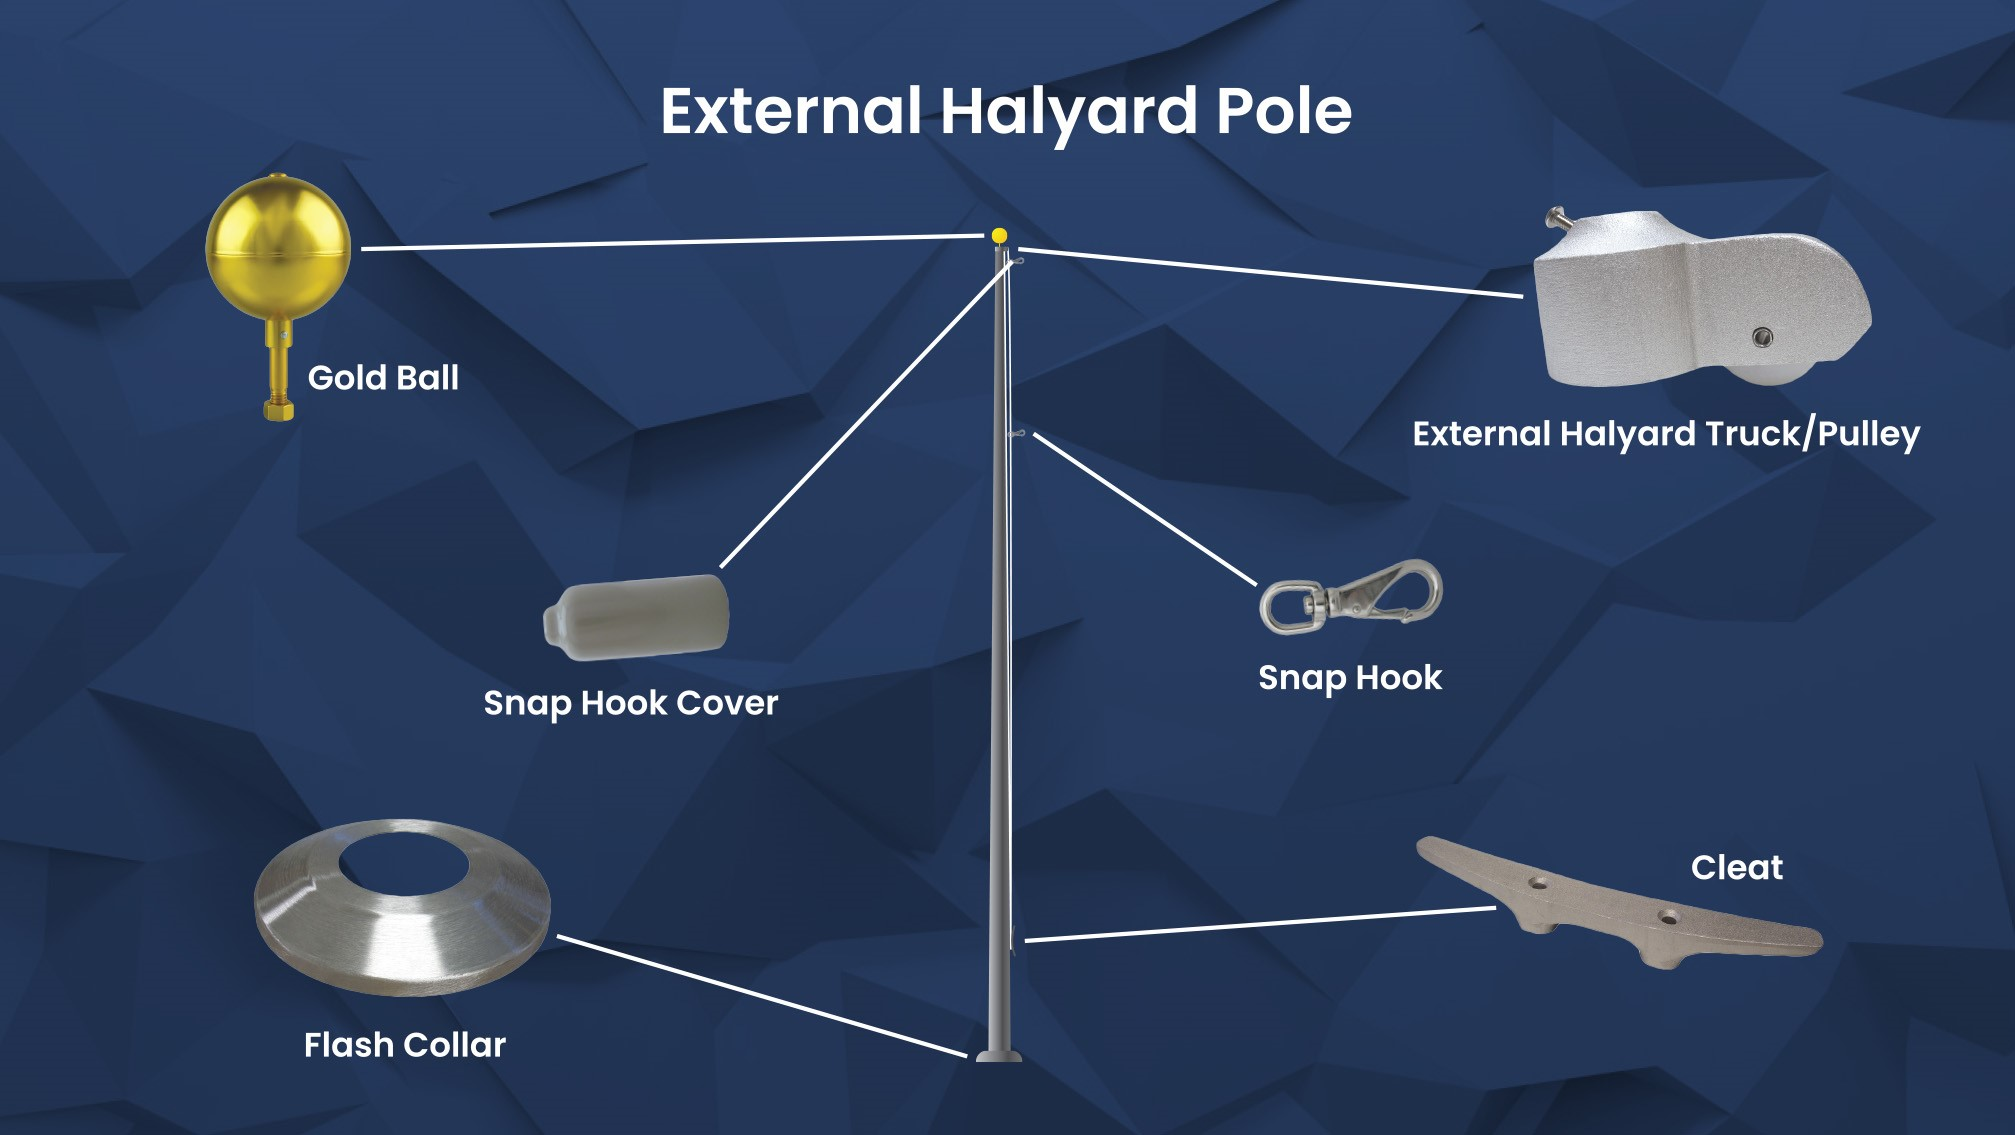 External Halyard